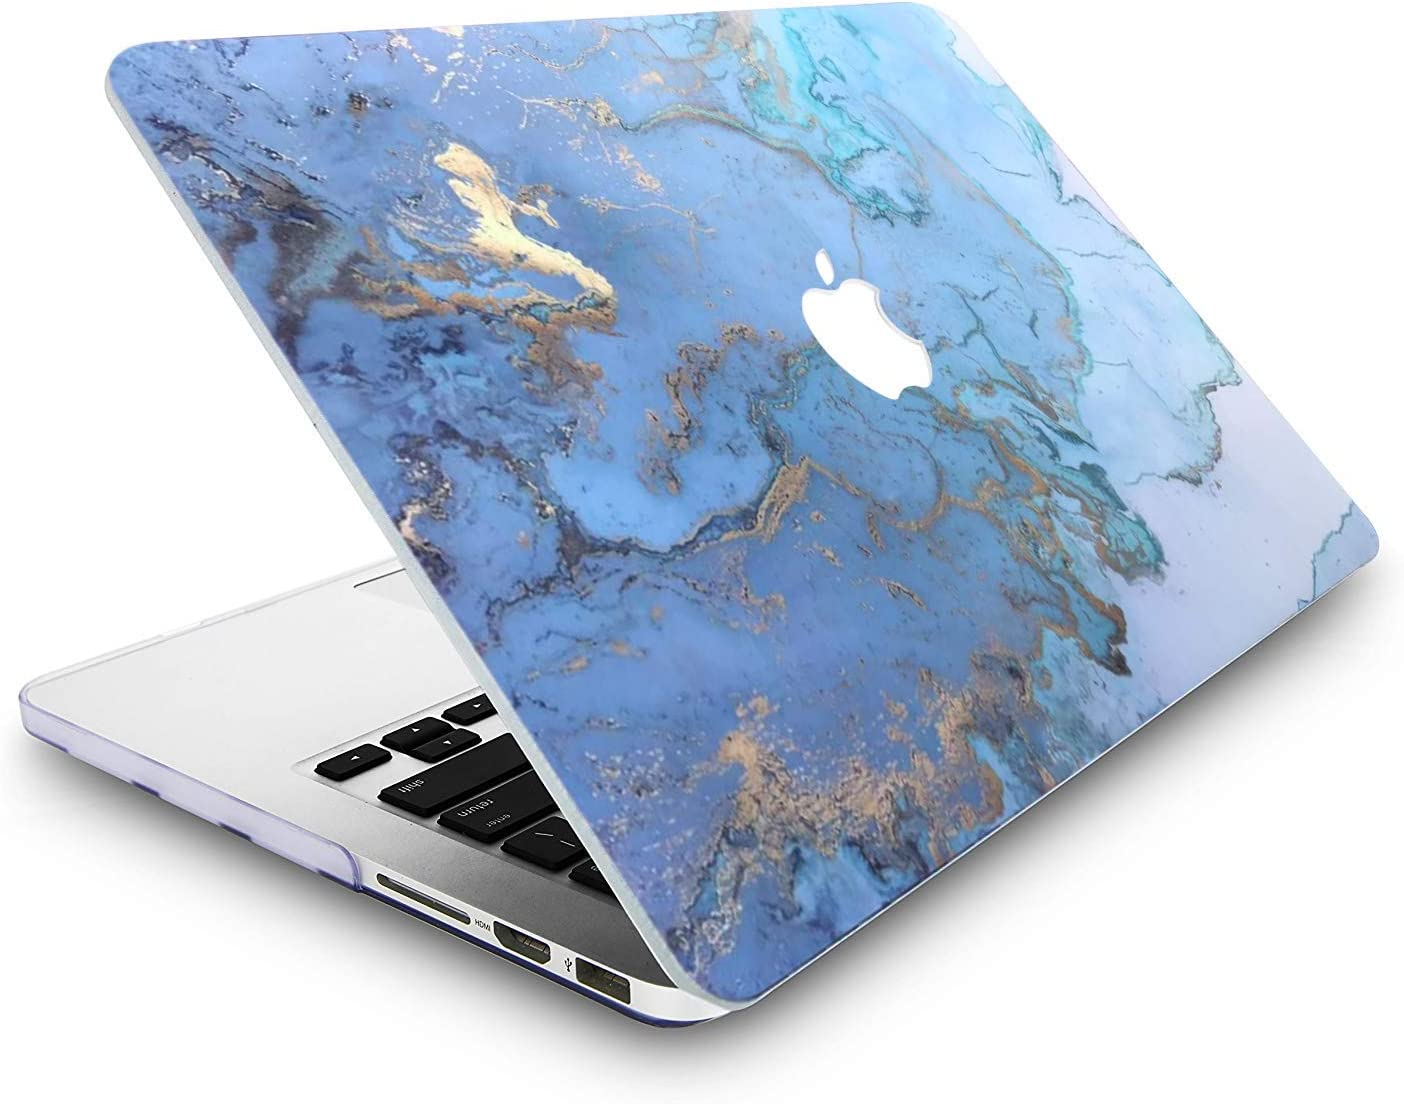 L2W Funda MacBook Pro Nuevo 13 Pulgadas con Touch Bar Modelo A1989//A1706//A1708 Pl/ástico de Impresi/ón Protecci/ón R/ígida el Patr/ón Cover con Relieves,Dise/ño de M/ármol Azul Lanzado en 2016~2018